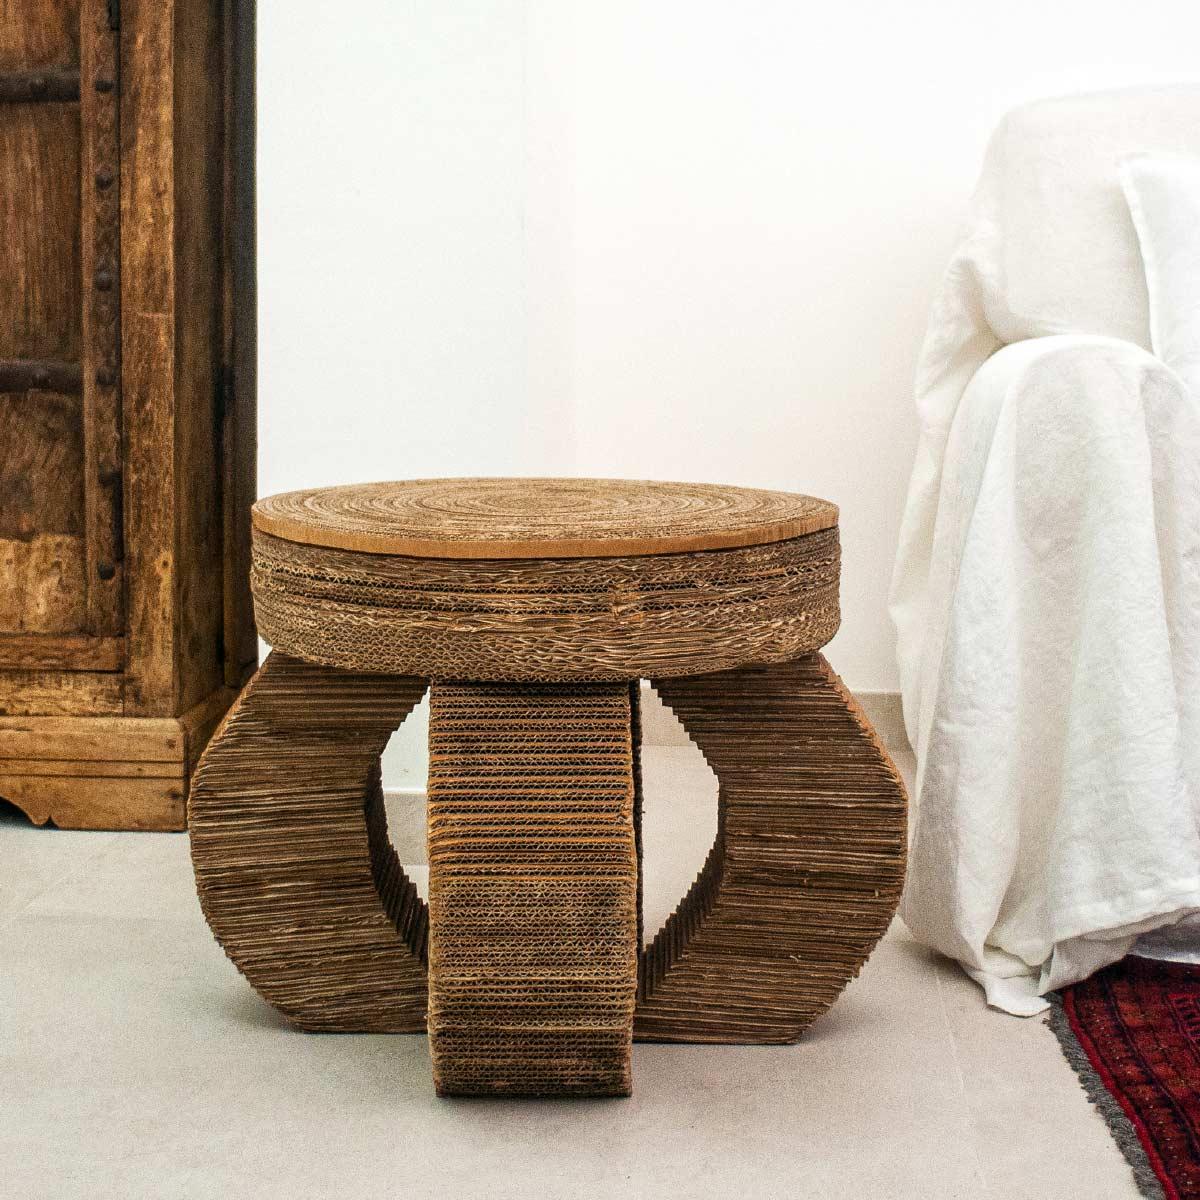 Alessandra Bray Stool Starter Cardboard Italiano Plurale artist